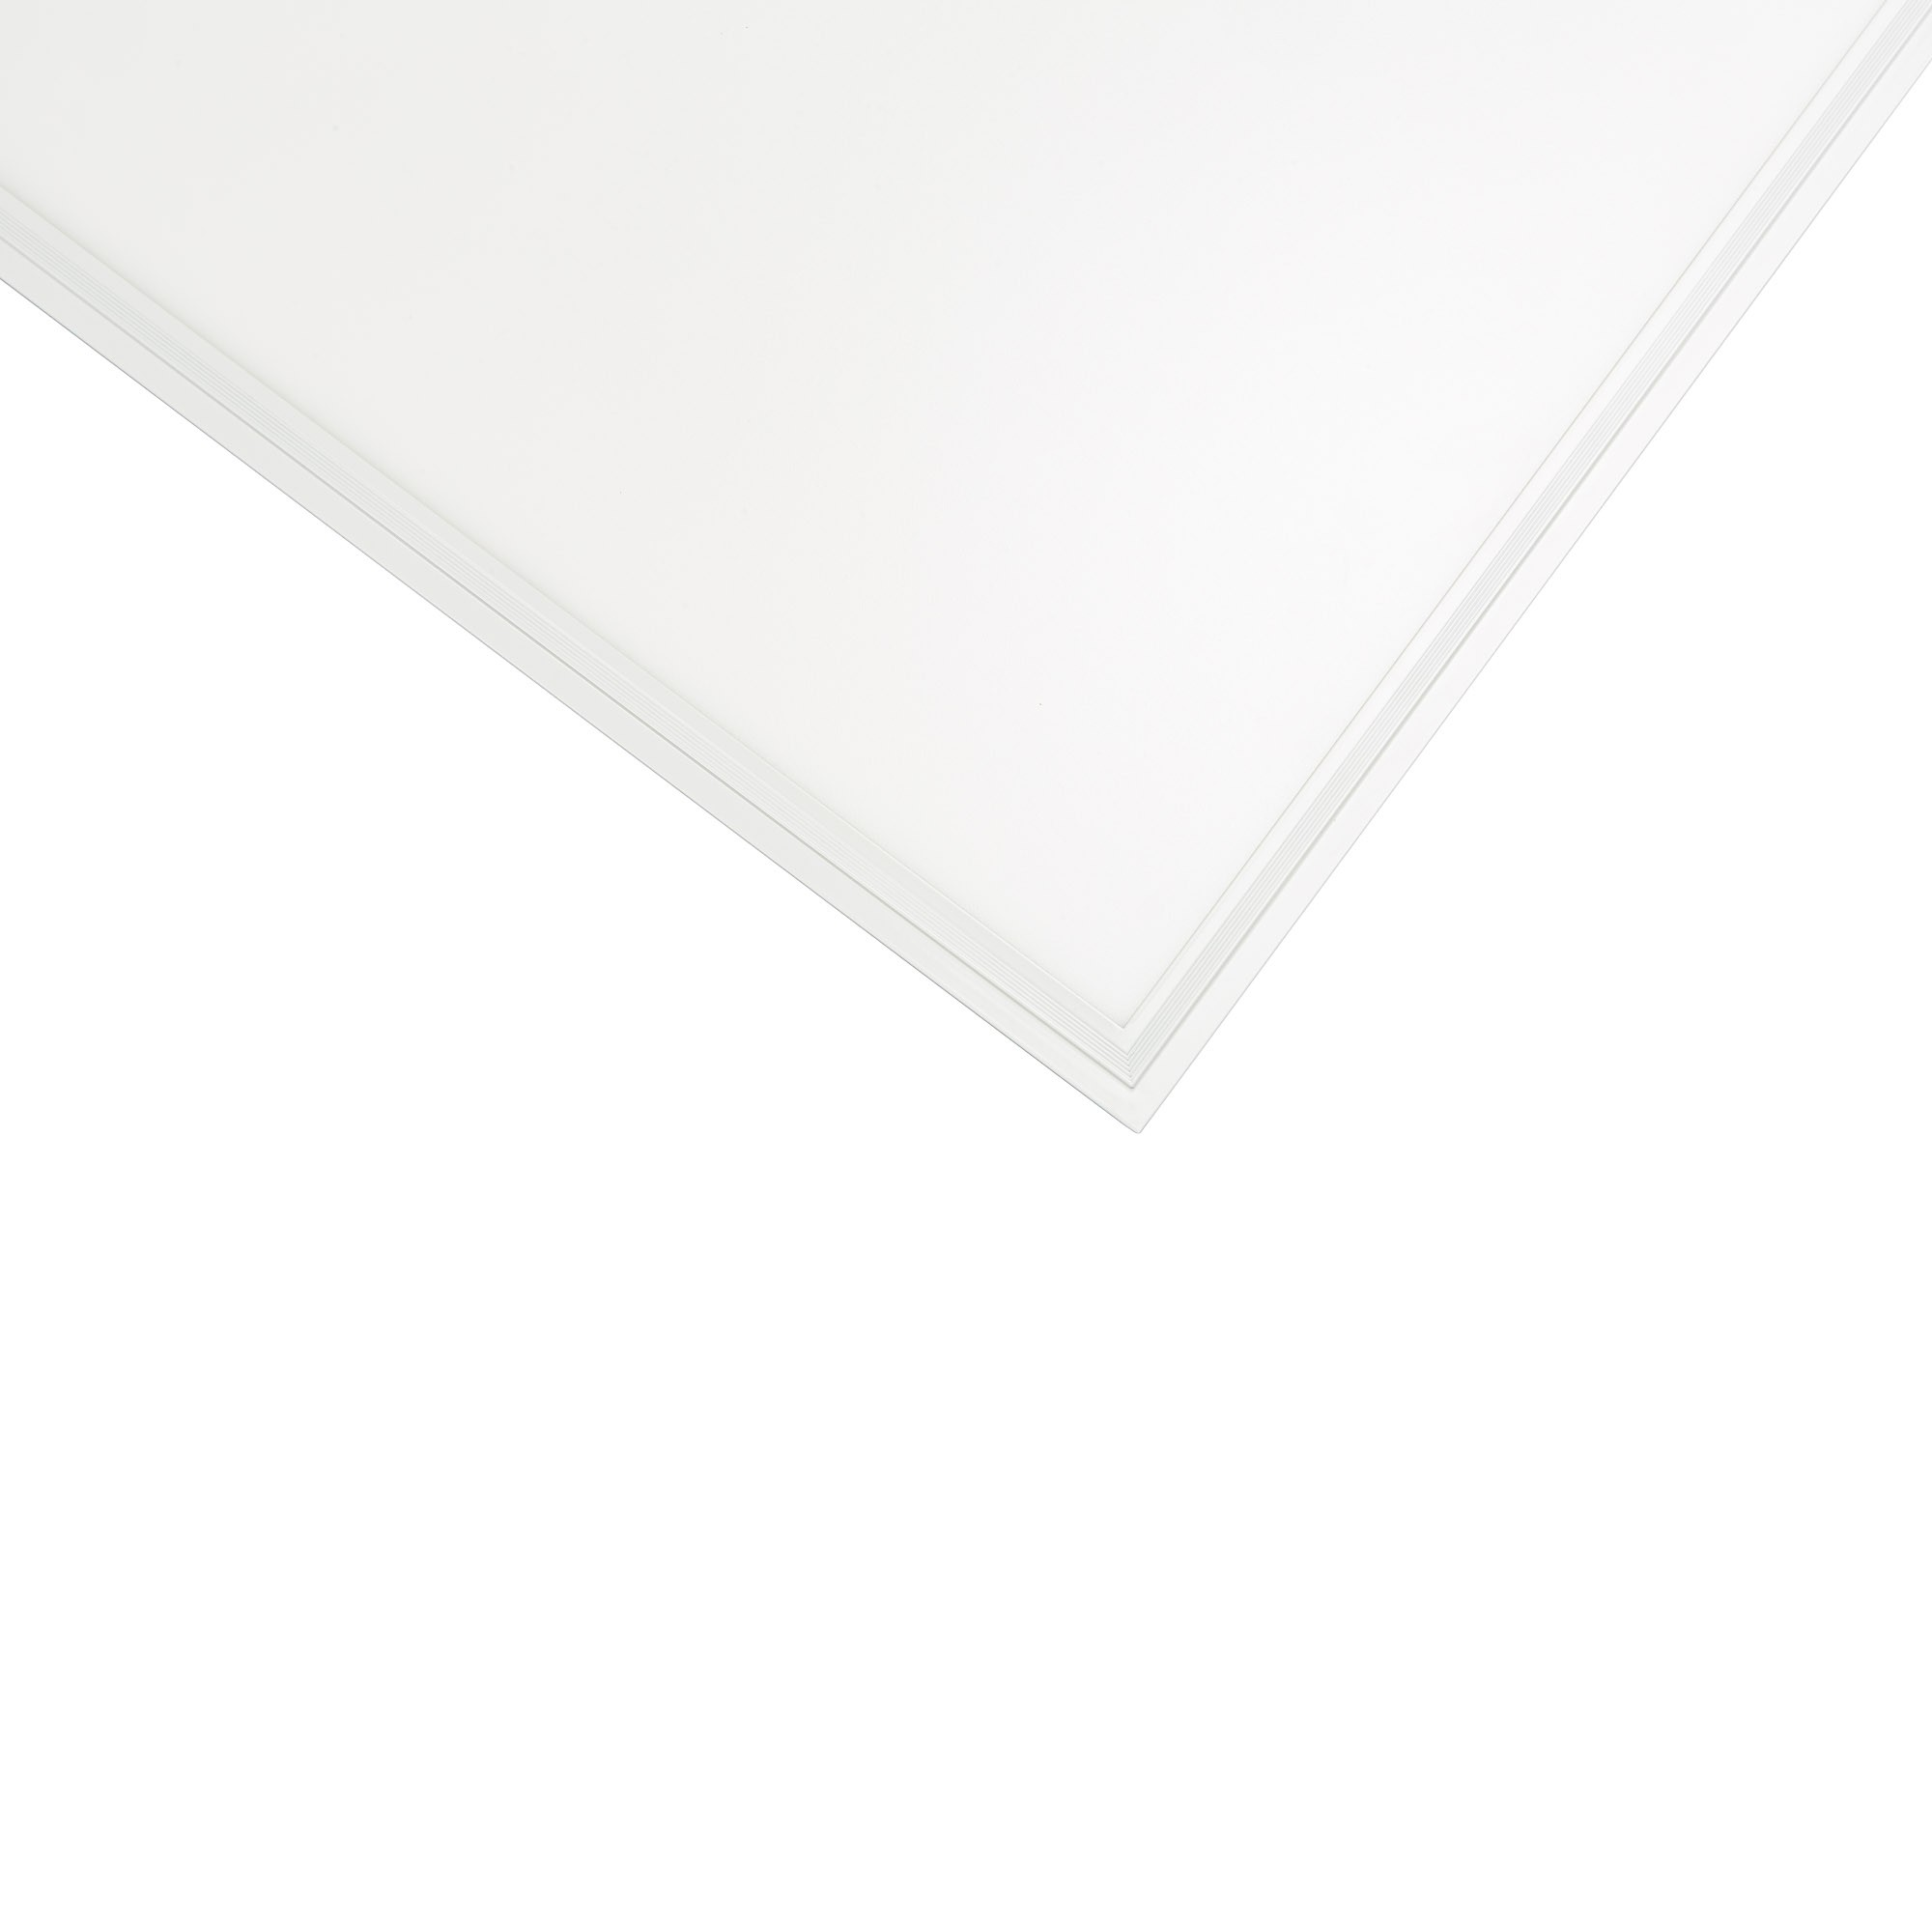 LED LIGHT PANEL - 36W - 600mm X 600mm - 6000K - 120L/W